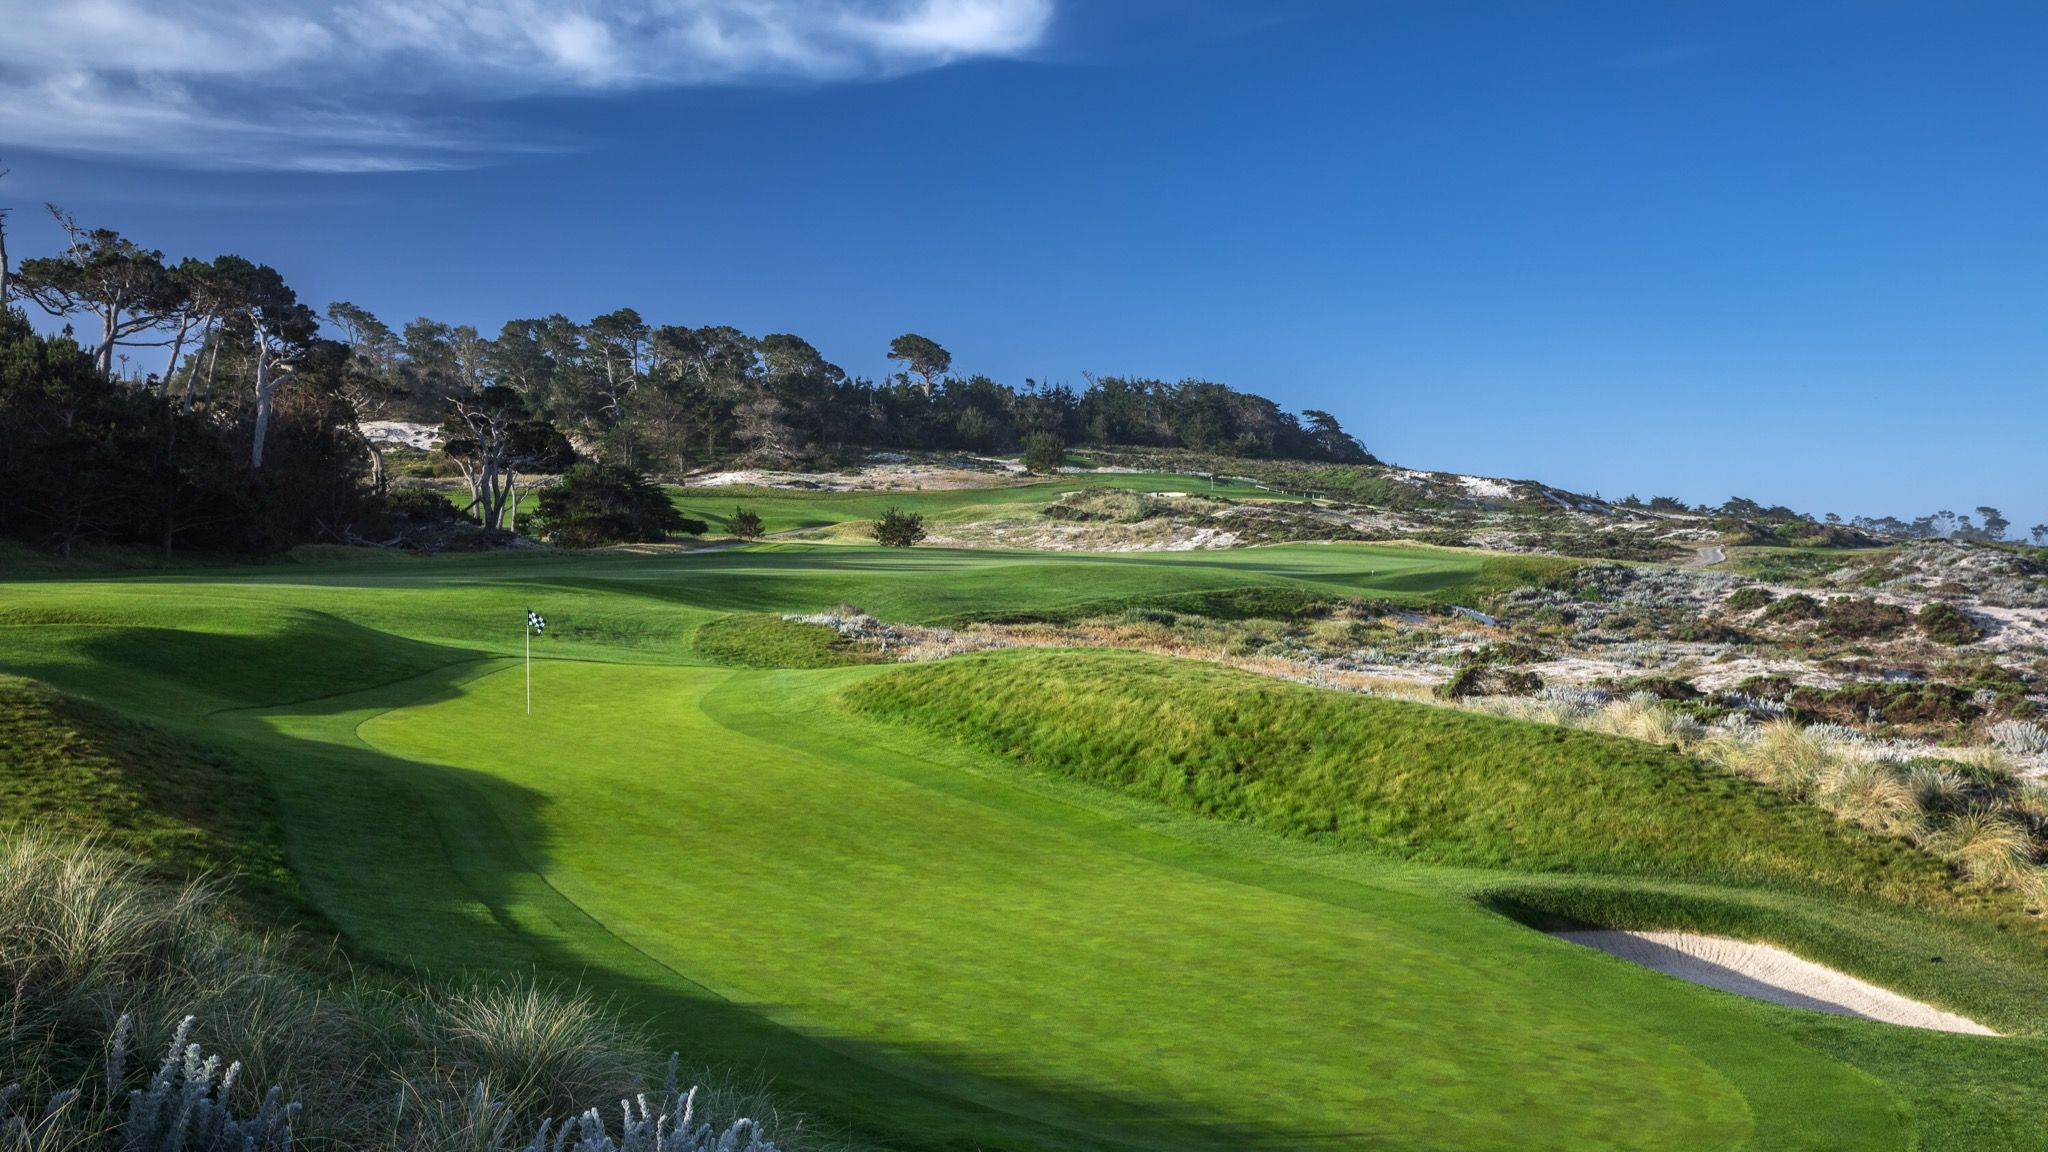 The Par 4 Fourth Hole Of Spyglass Hill Golf Course Pebble Beach California Golf Courses Public Golf Courses Golf